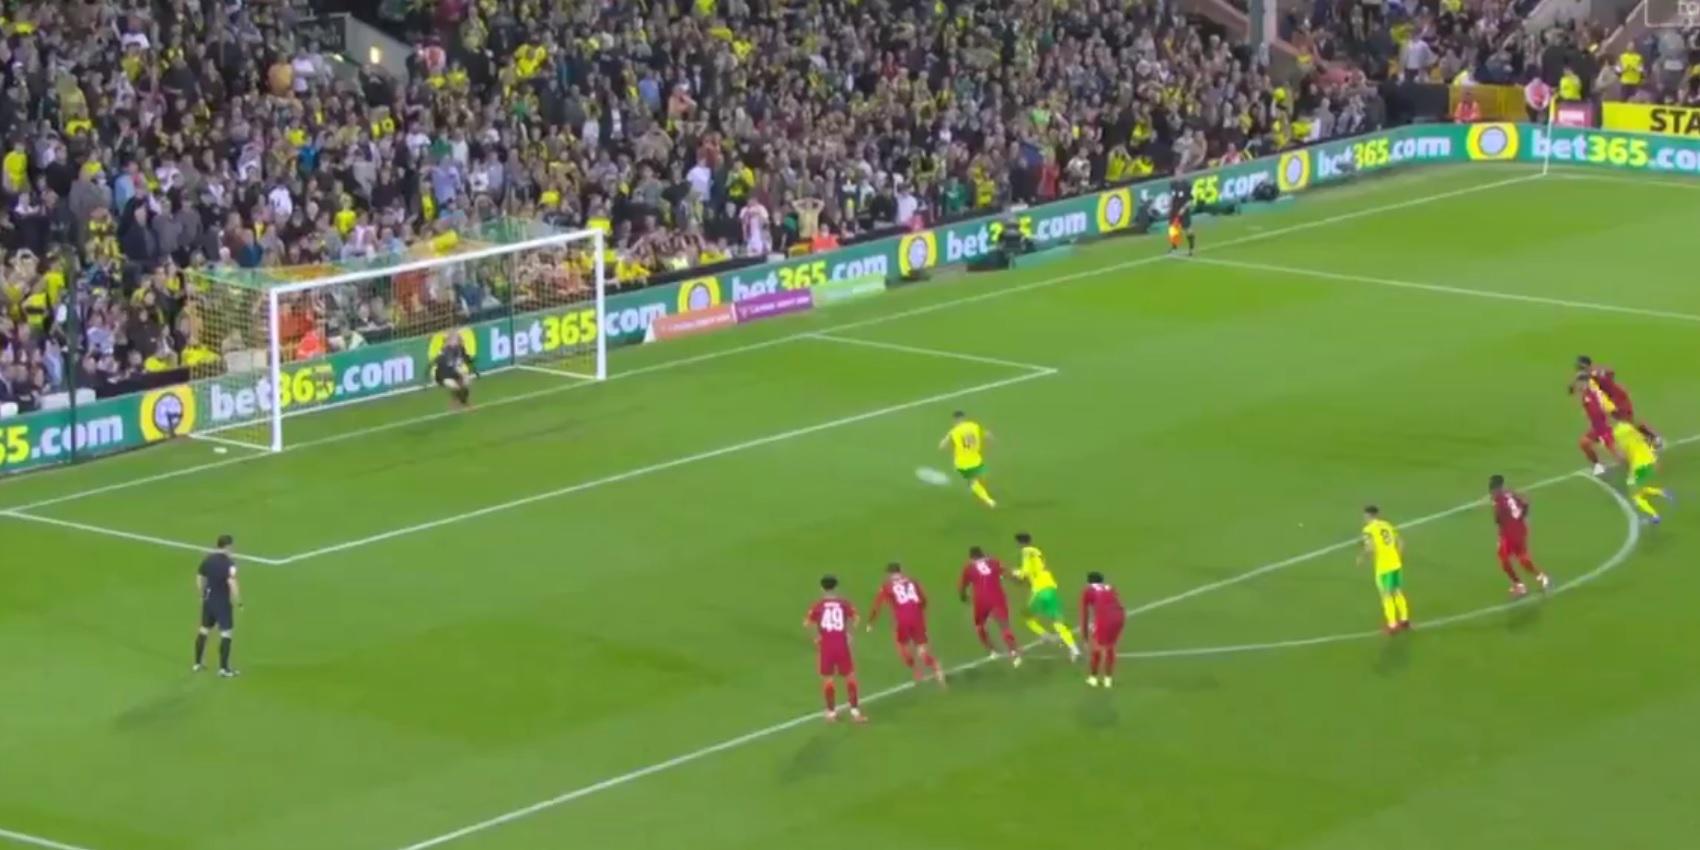 (Video) Liverpool goalkeeper Caoimhin Kelleher denies Norwich City penalty-kick